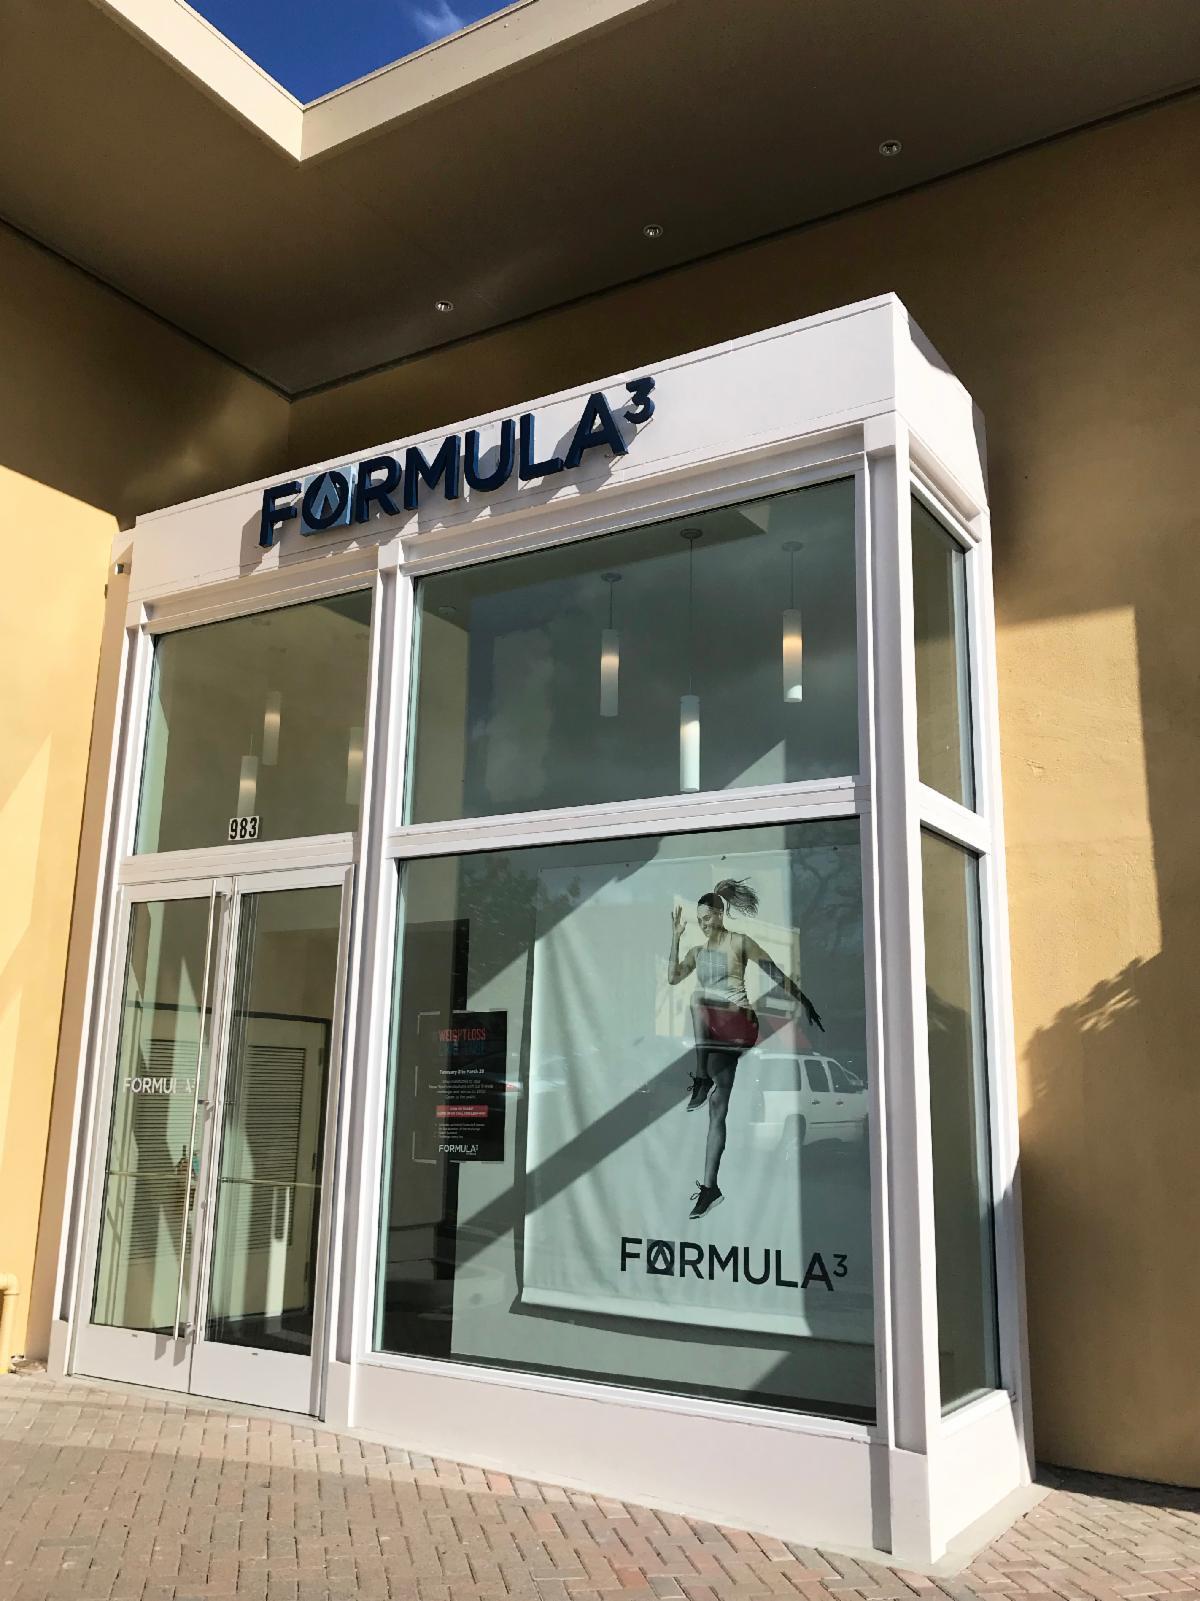 Formula 3 Fitness